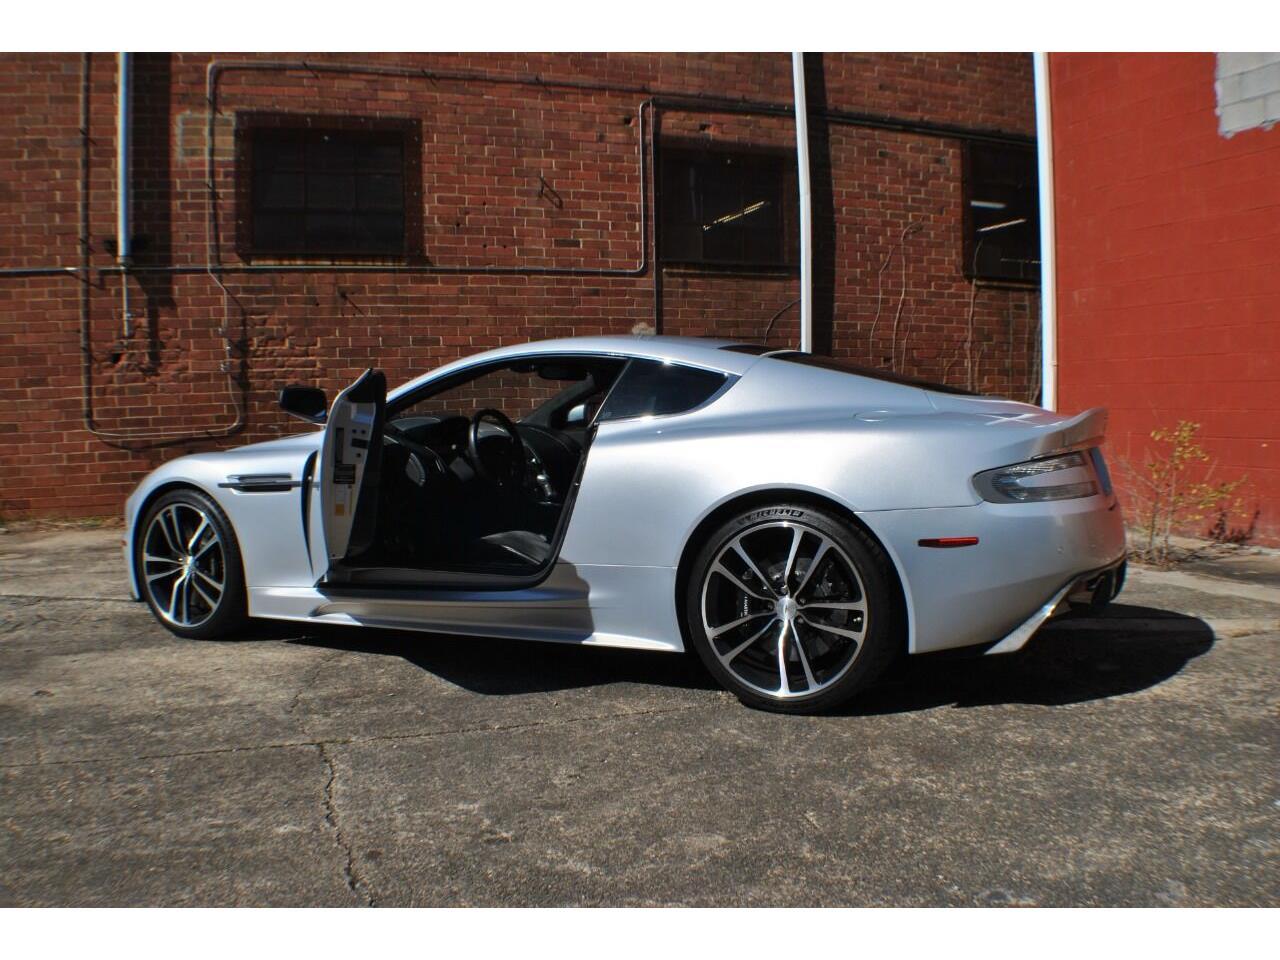 2009 Aston Martin DBS (CC-1299212) for sale in Charlotte, North Carolina